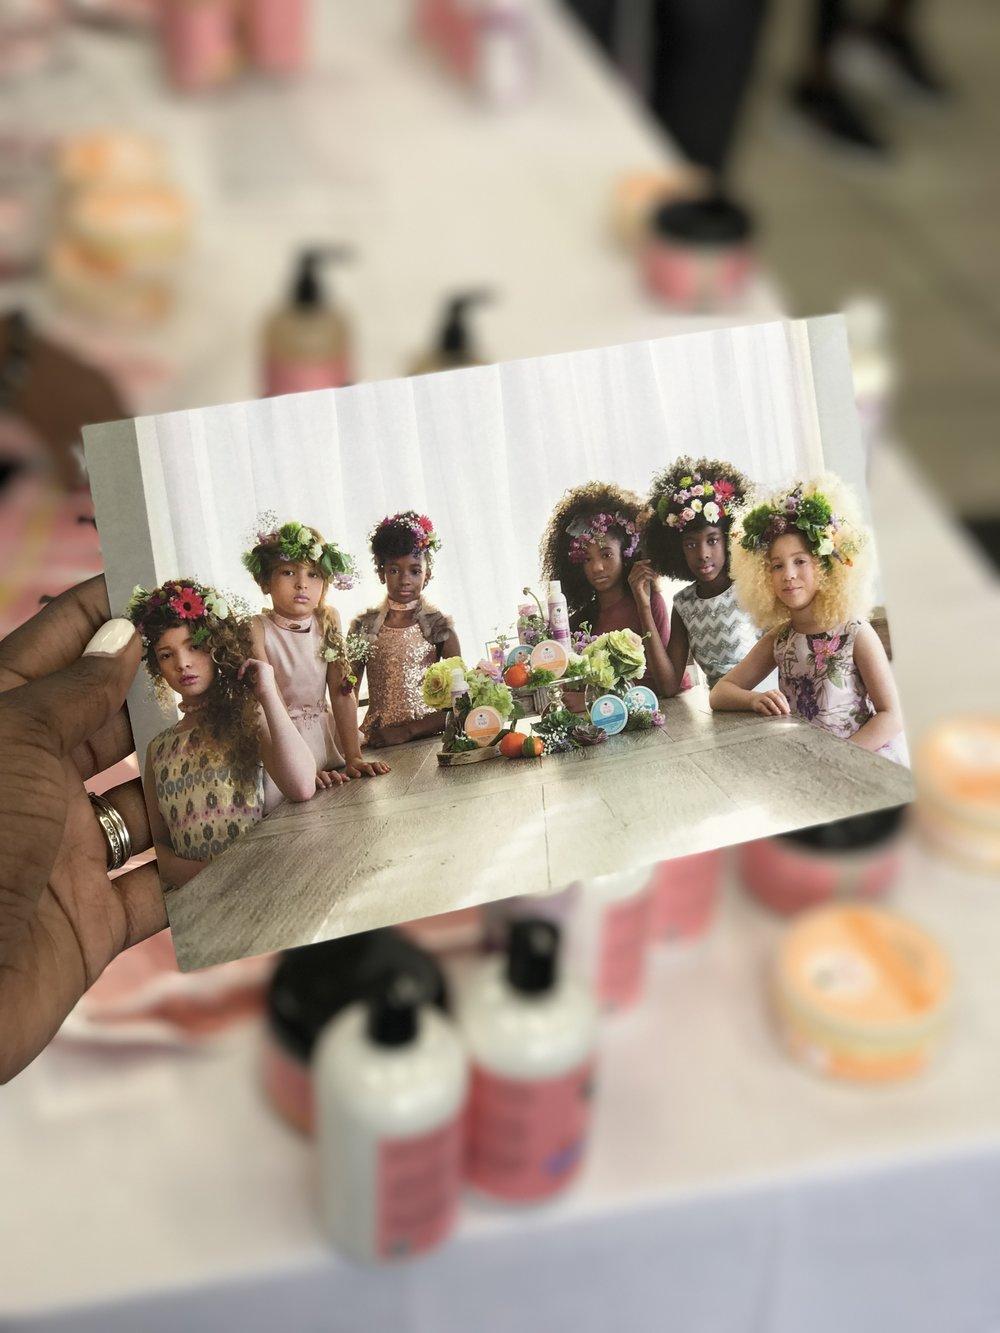 Camille_Rose_Naturals_Dayna_Bolden_Mothers_day_tour_2017_29.jpg